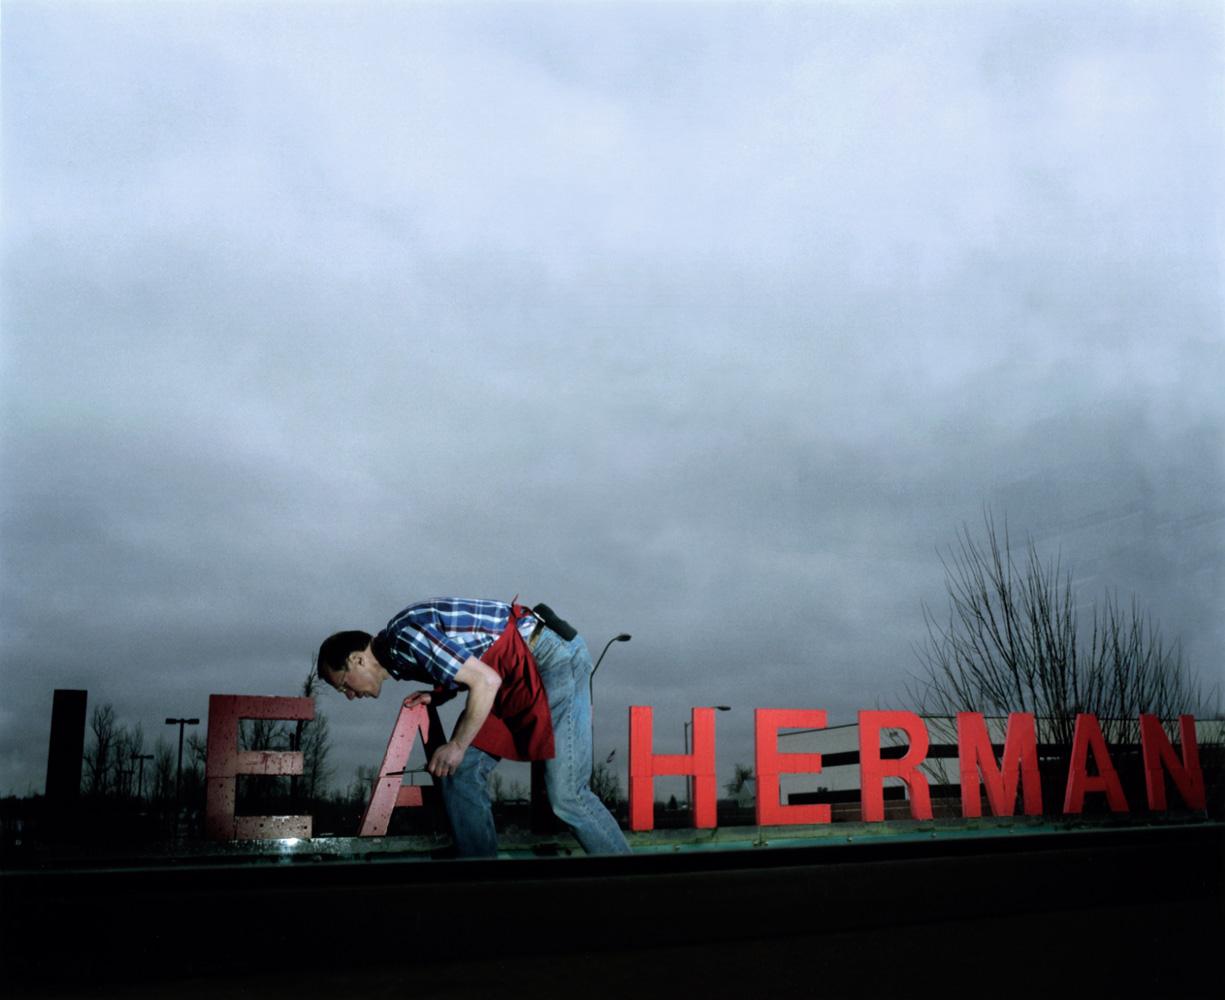 Tim Leatherman